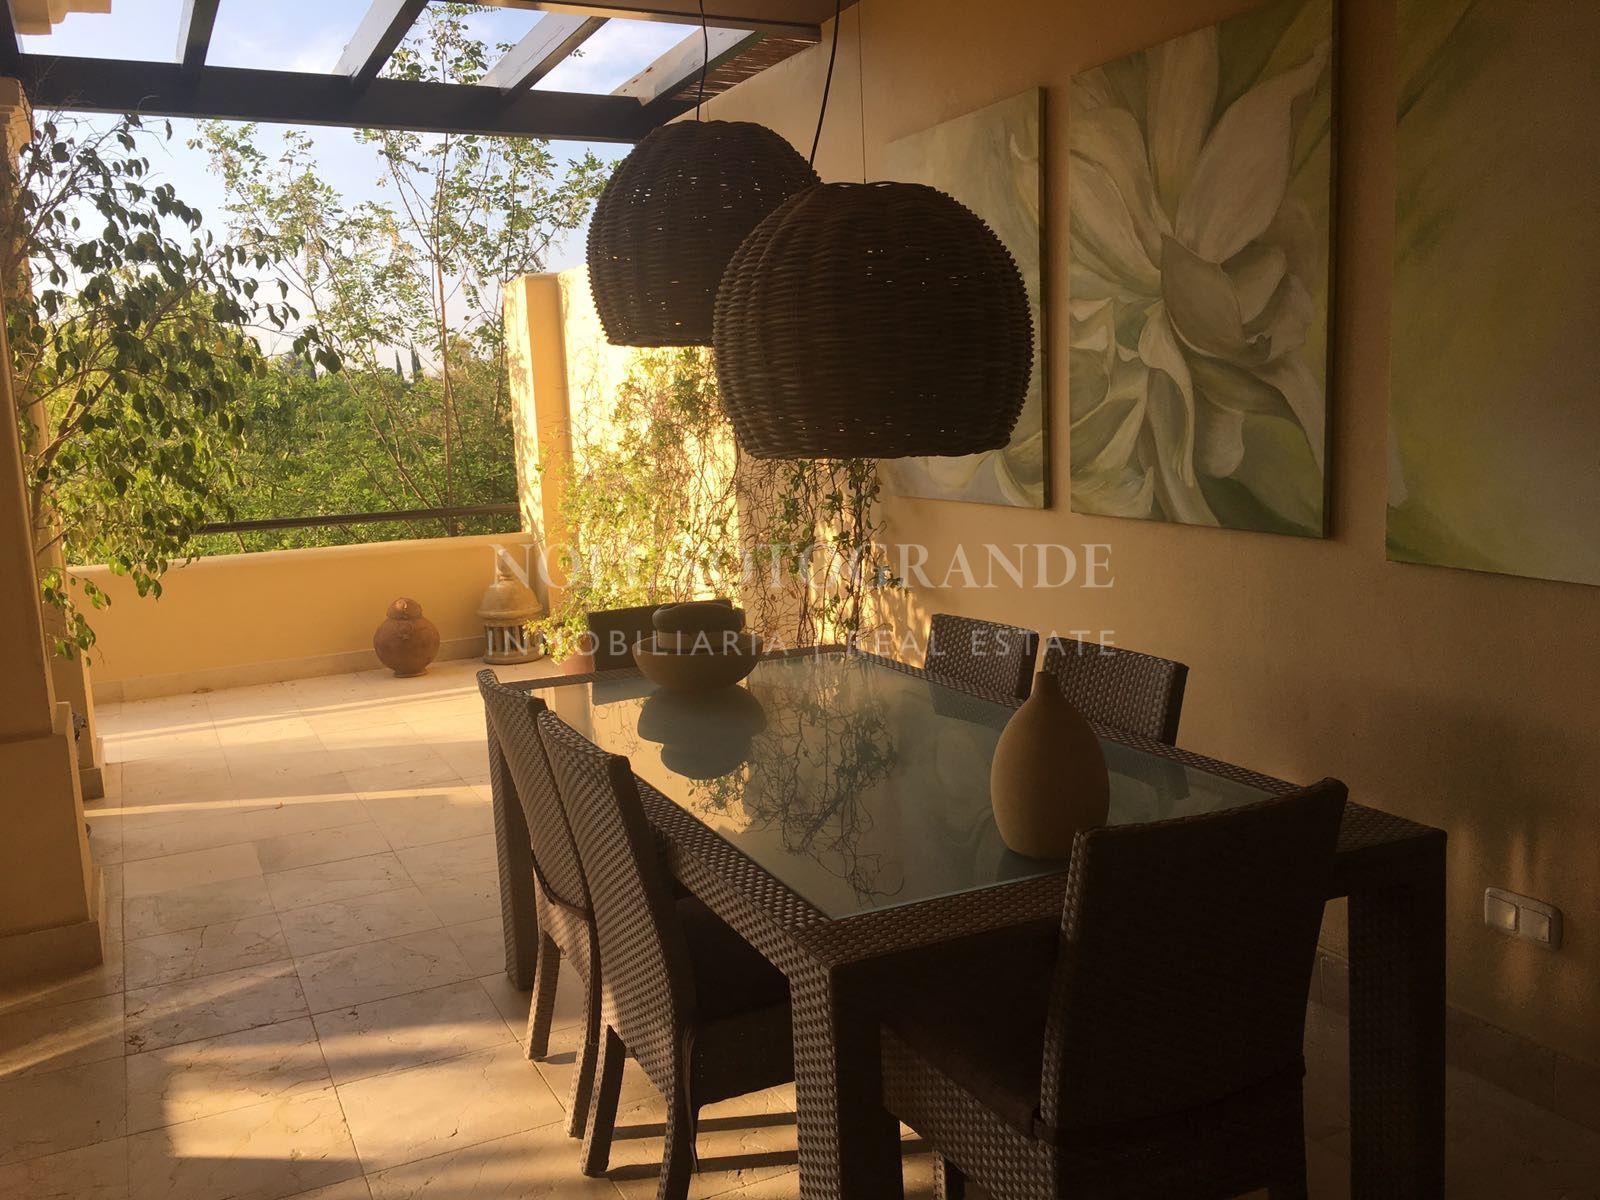 Sotogrande, Valgrande - 3 bedroom Apartment For Sale